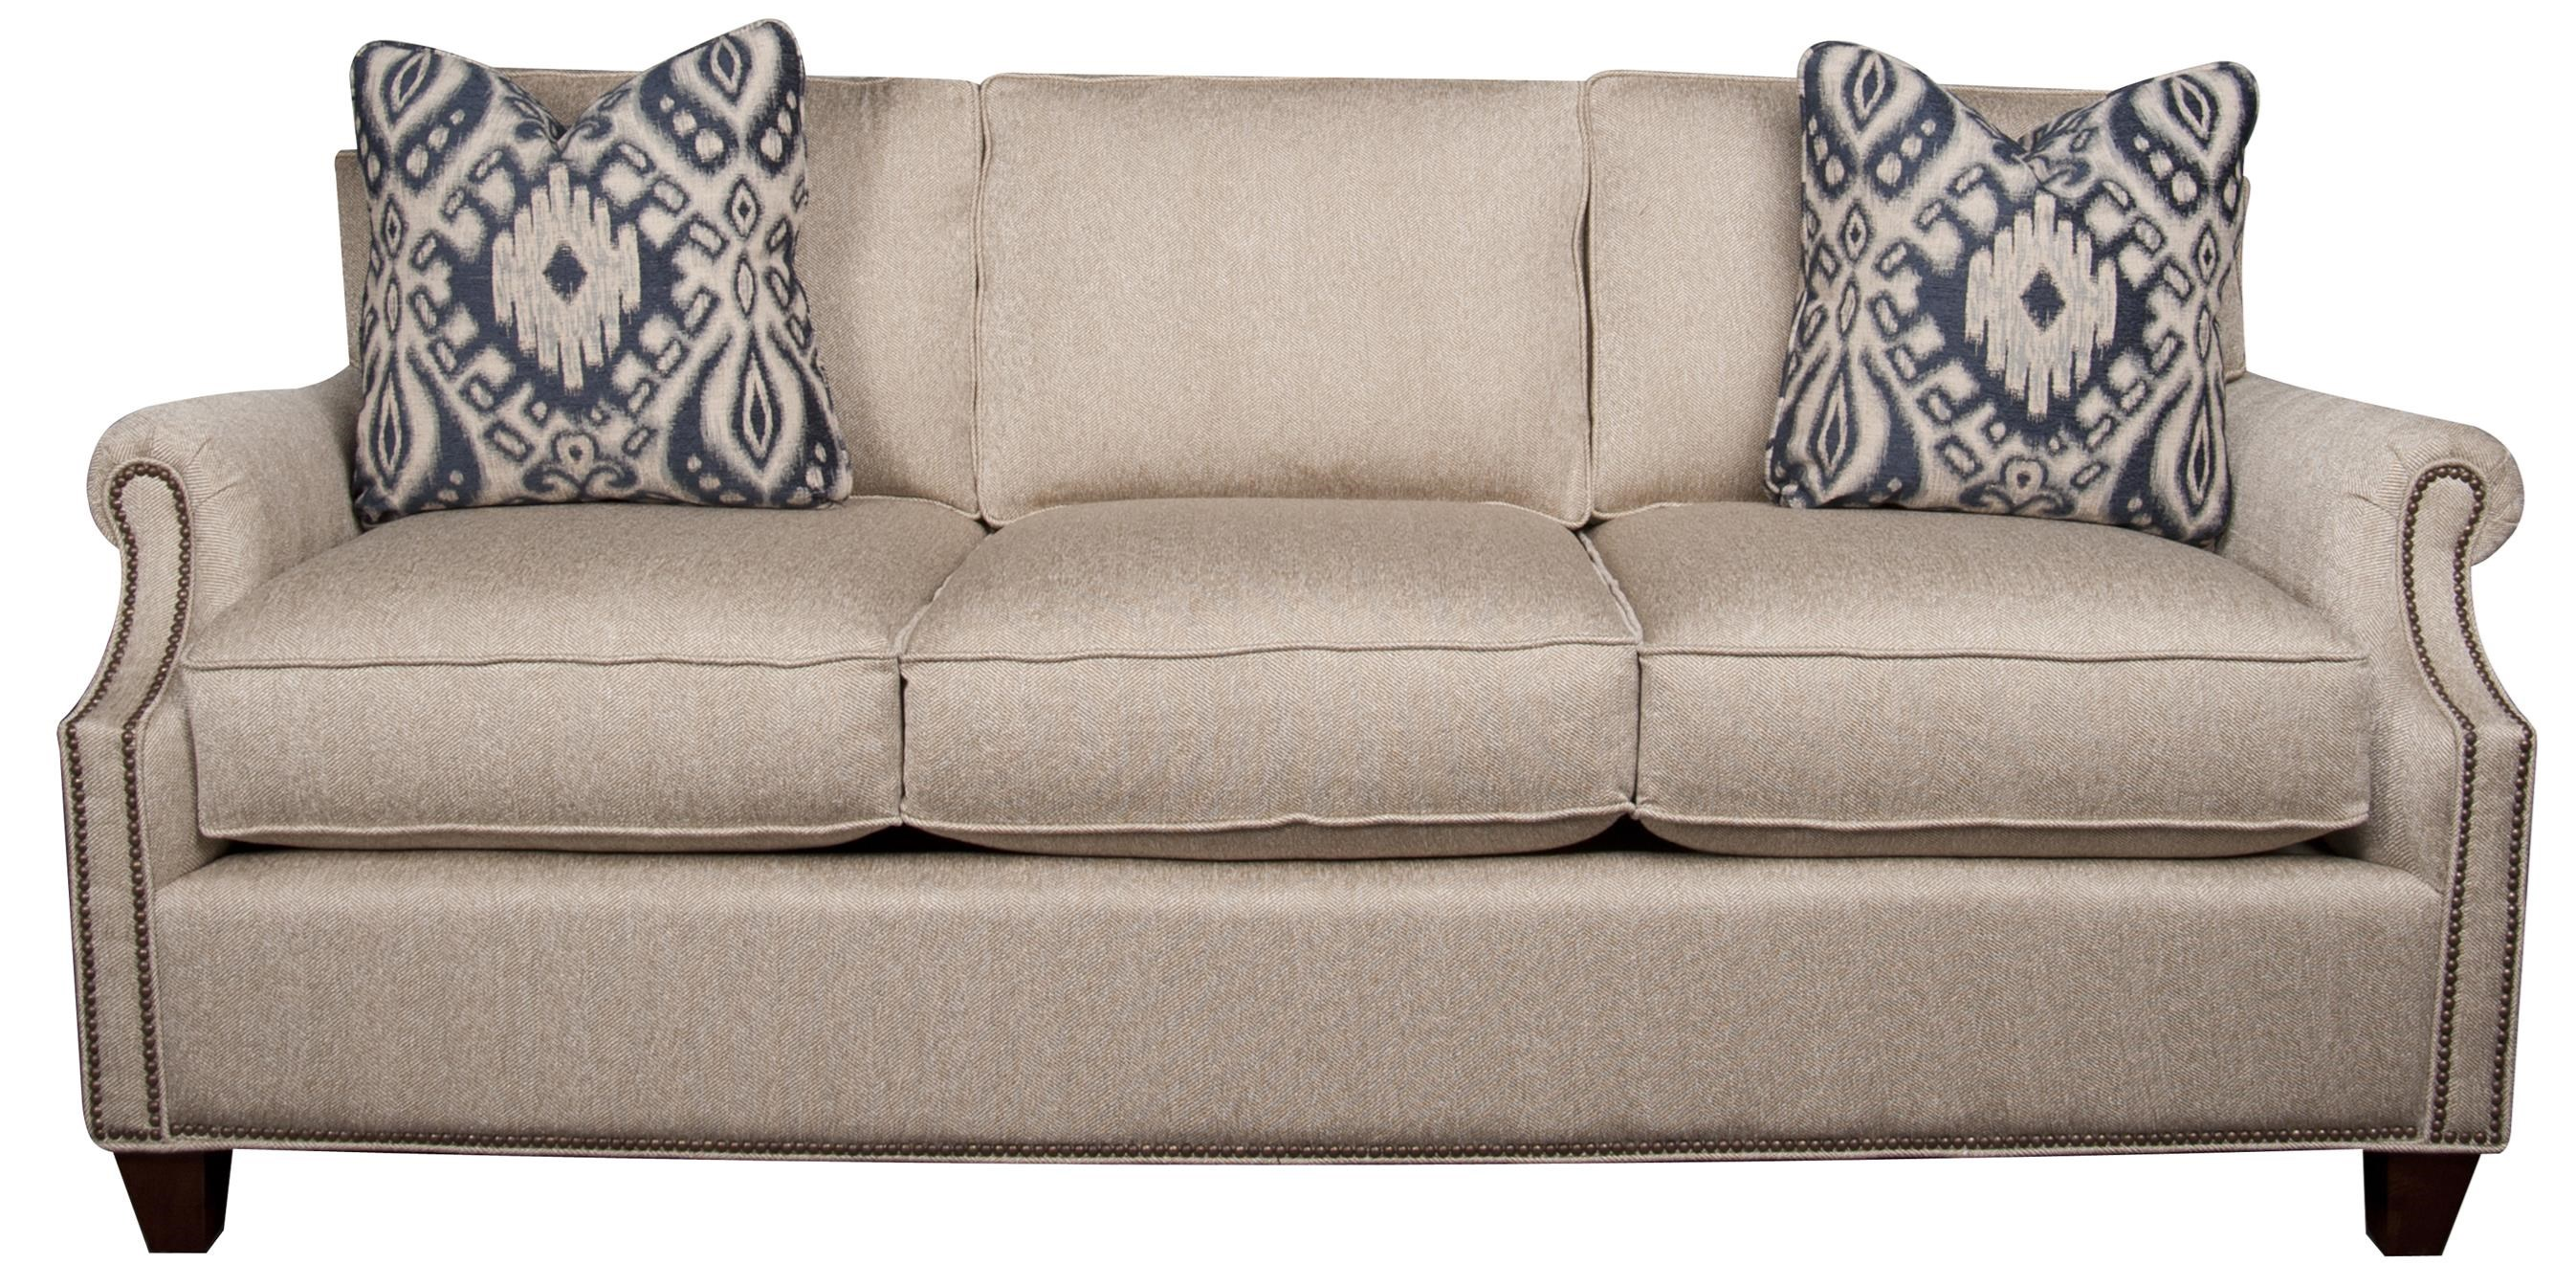 Morris Home Furnishings Hadley Hadley Sofa - Item Number: 526084016